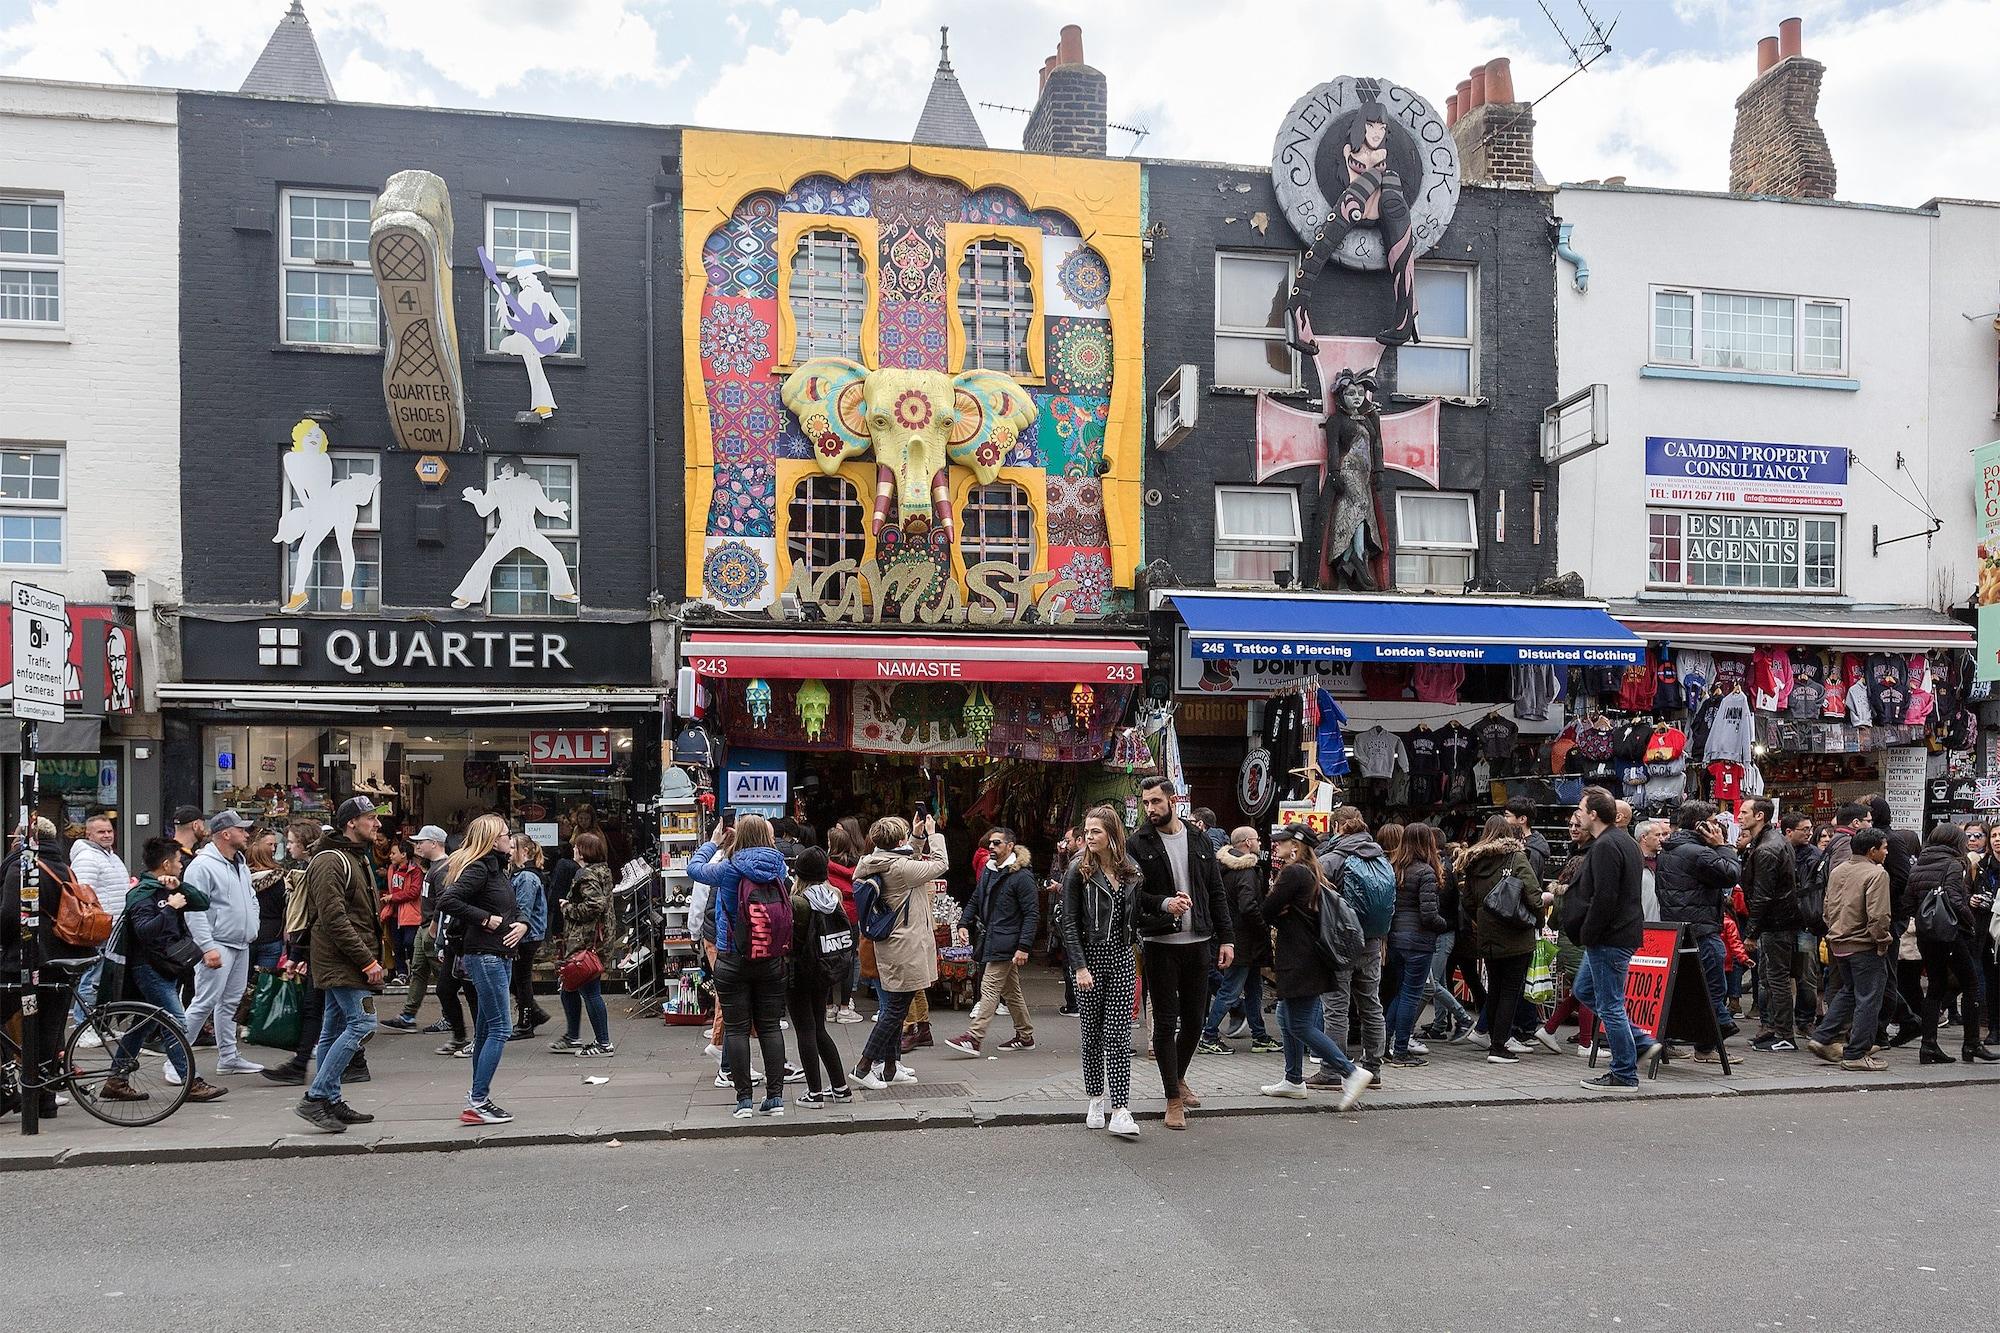 Heart of Camden, London